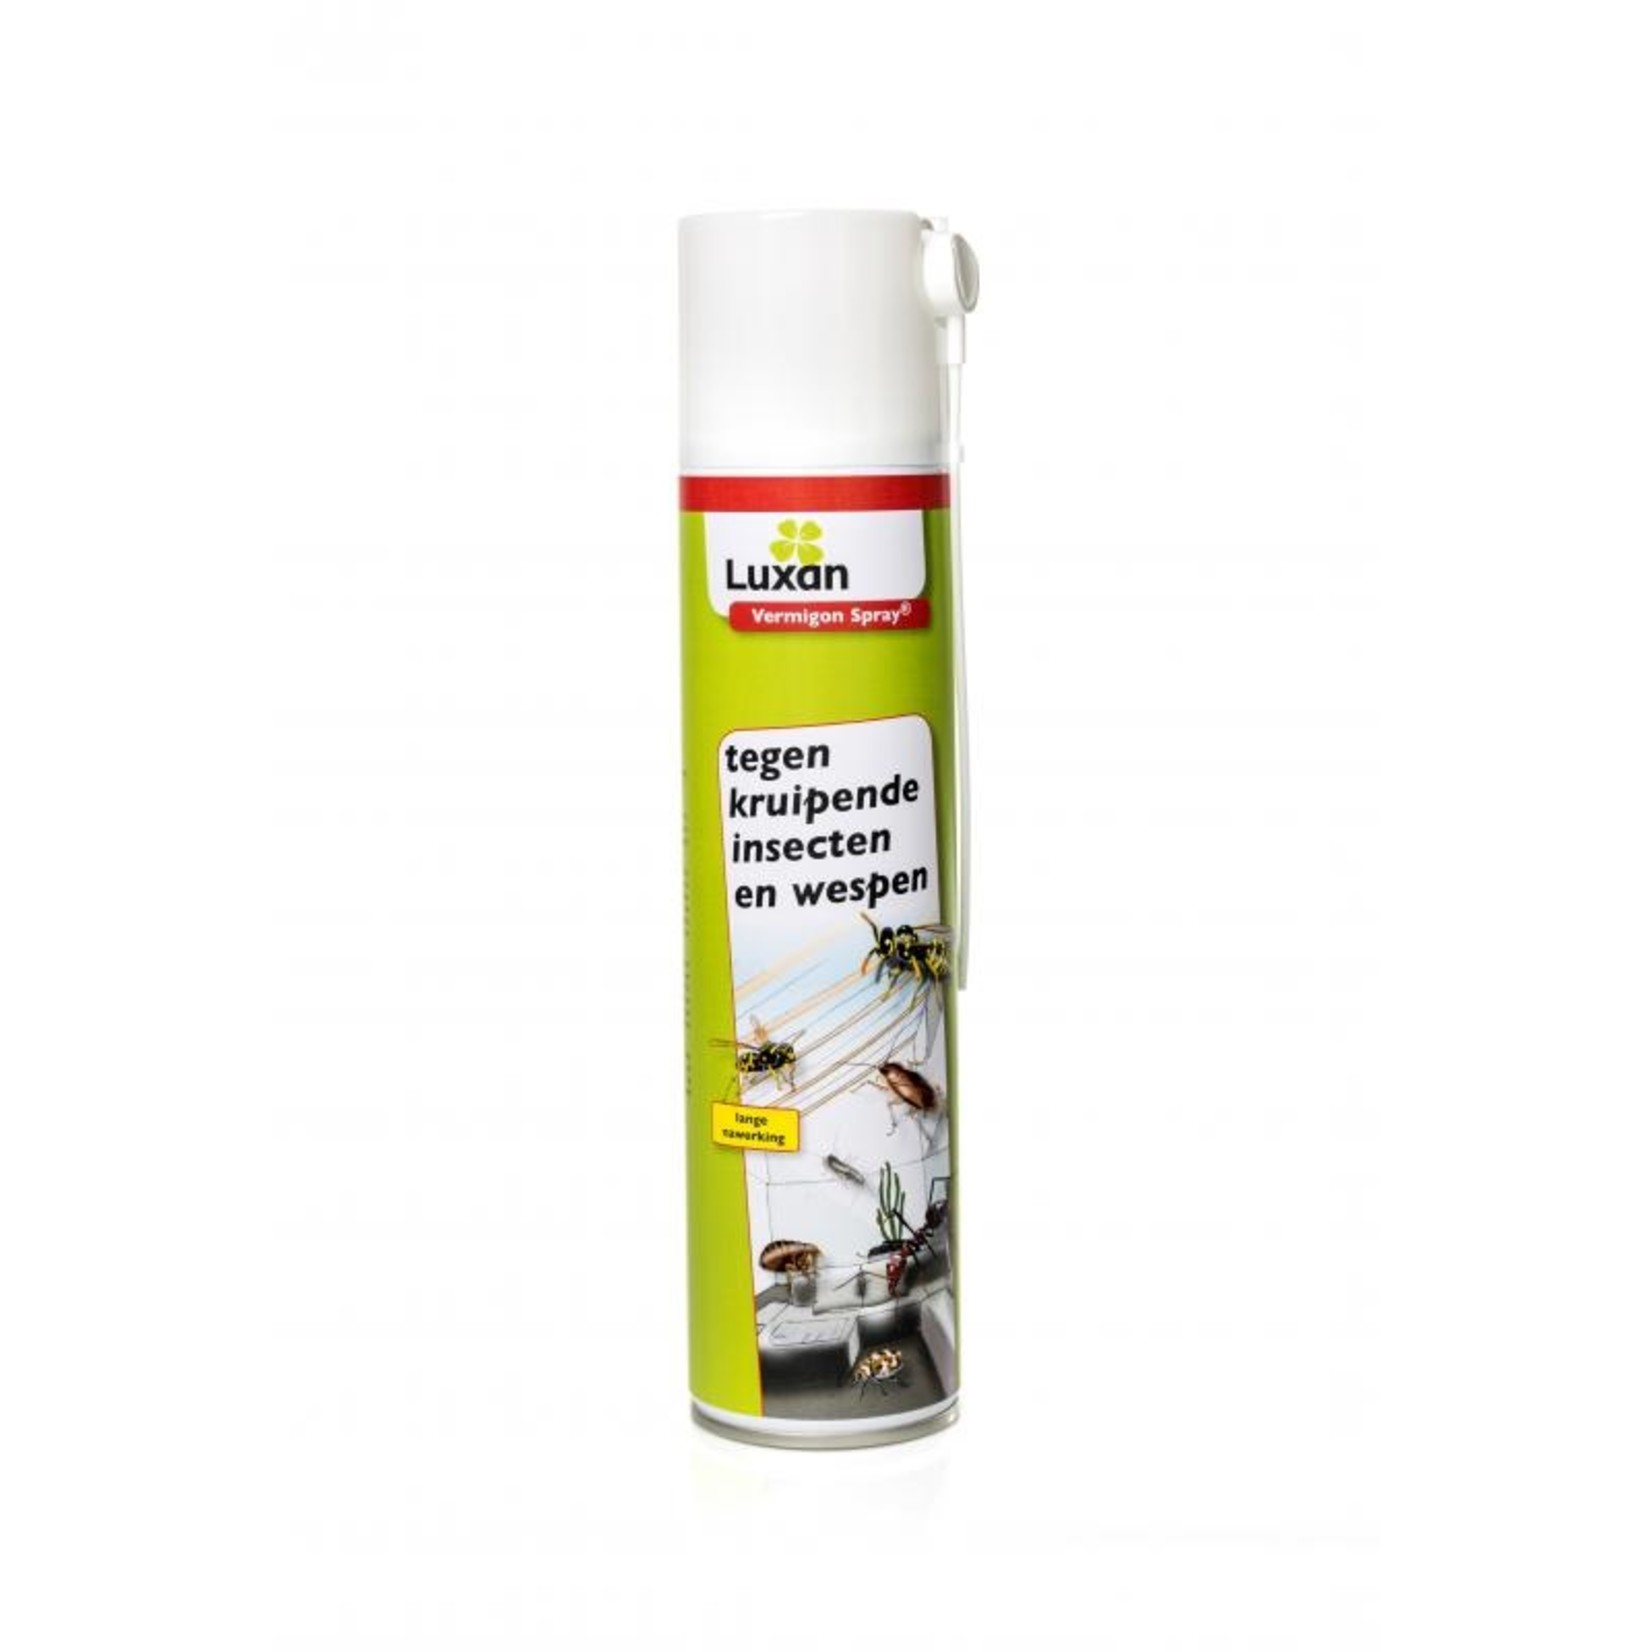 Luxan Vermigon kruipend ongedierte Spray 400 ml